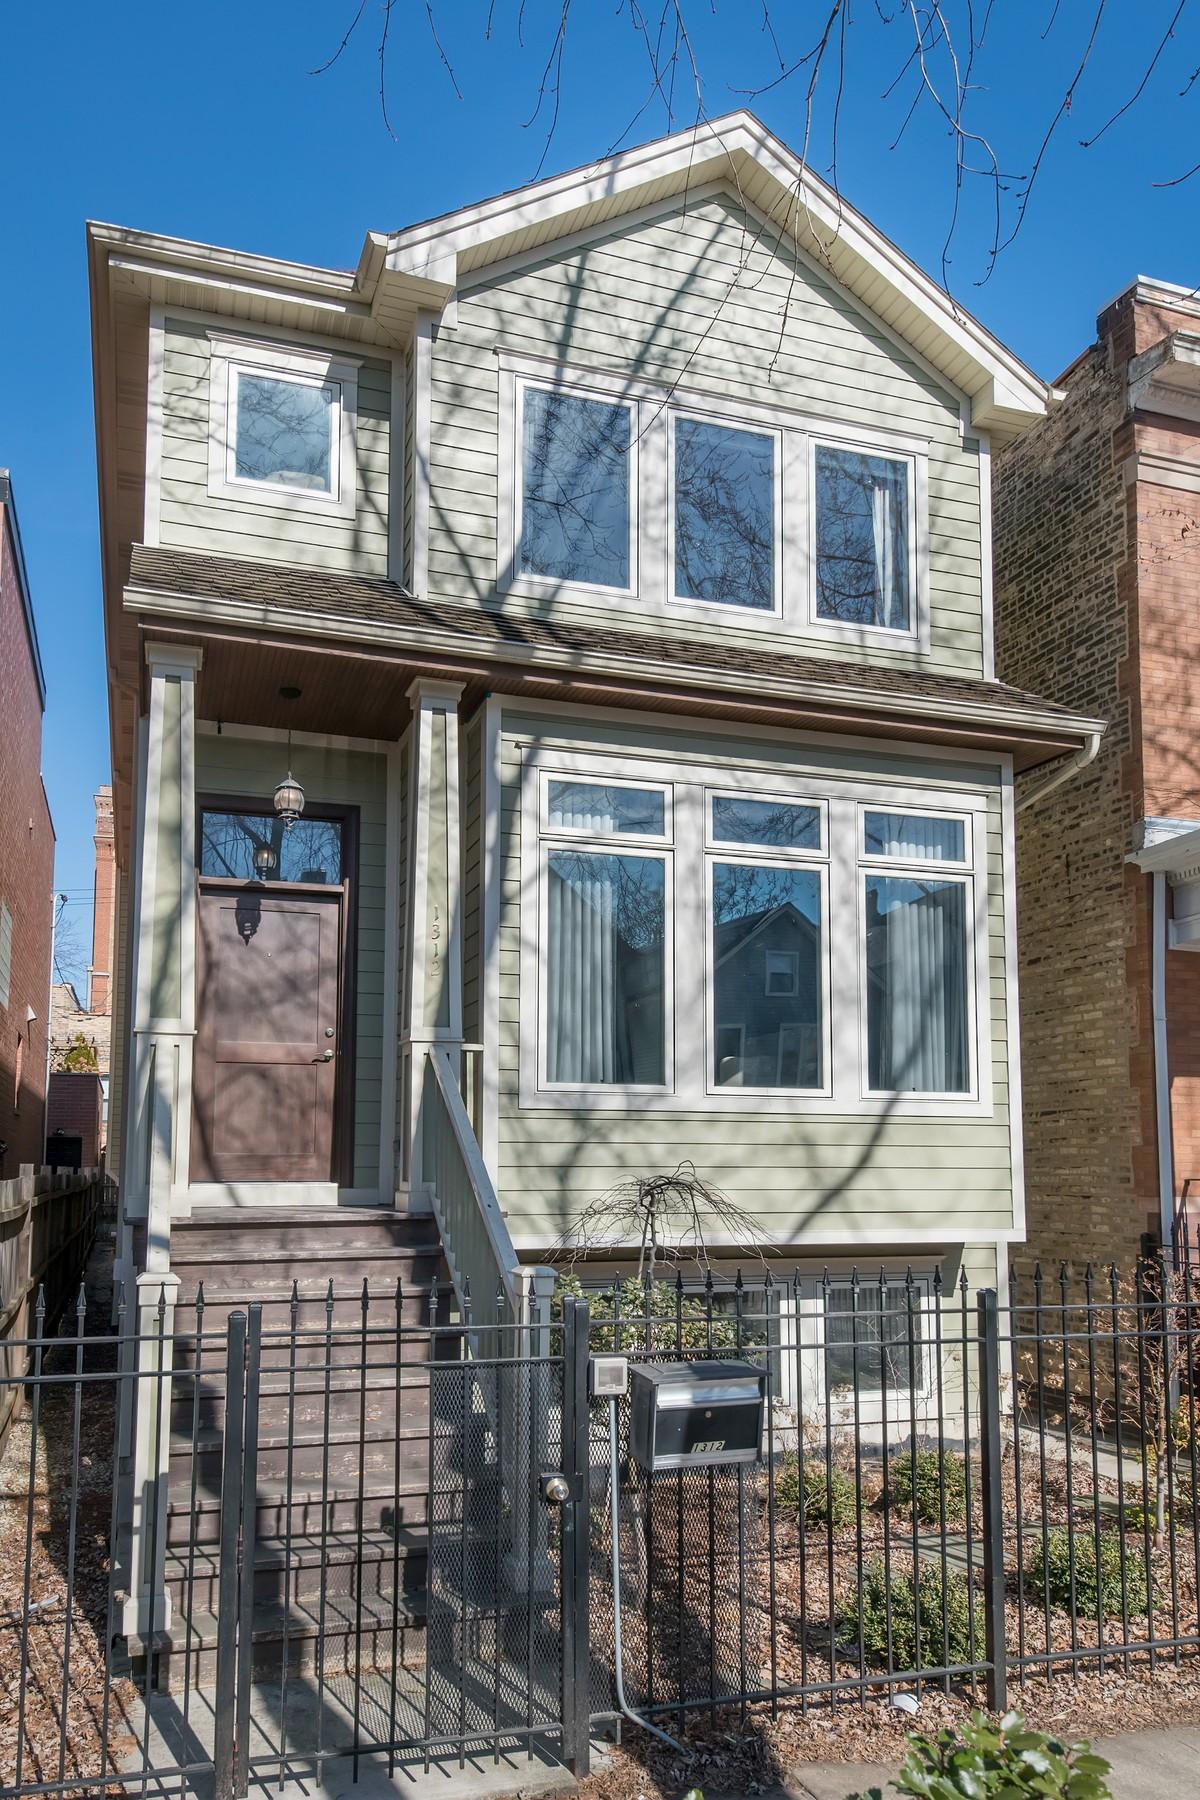 獨棟家庭住宅 為 出售 在 Perfect Lakeview Home In Burley School District! 1312 W Barry Avenue Lakeview, Chicago, 伊利諾斯州, 60657 美國